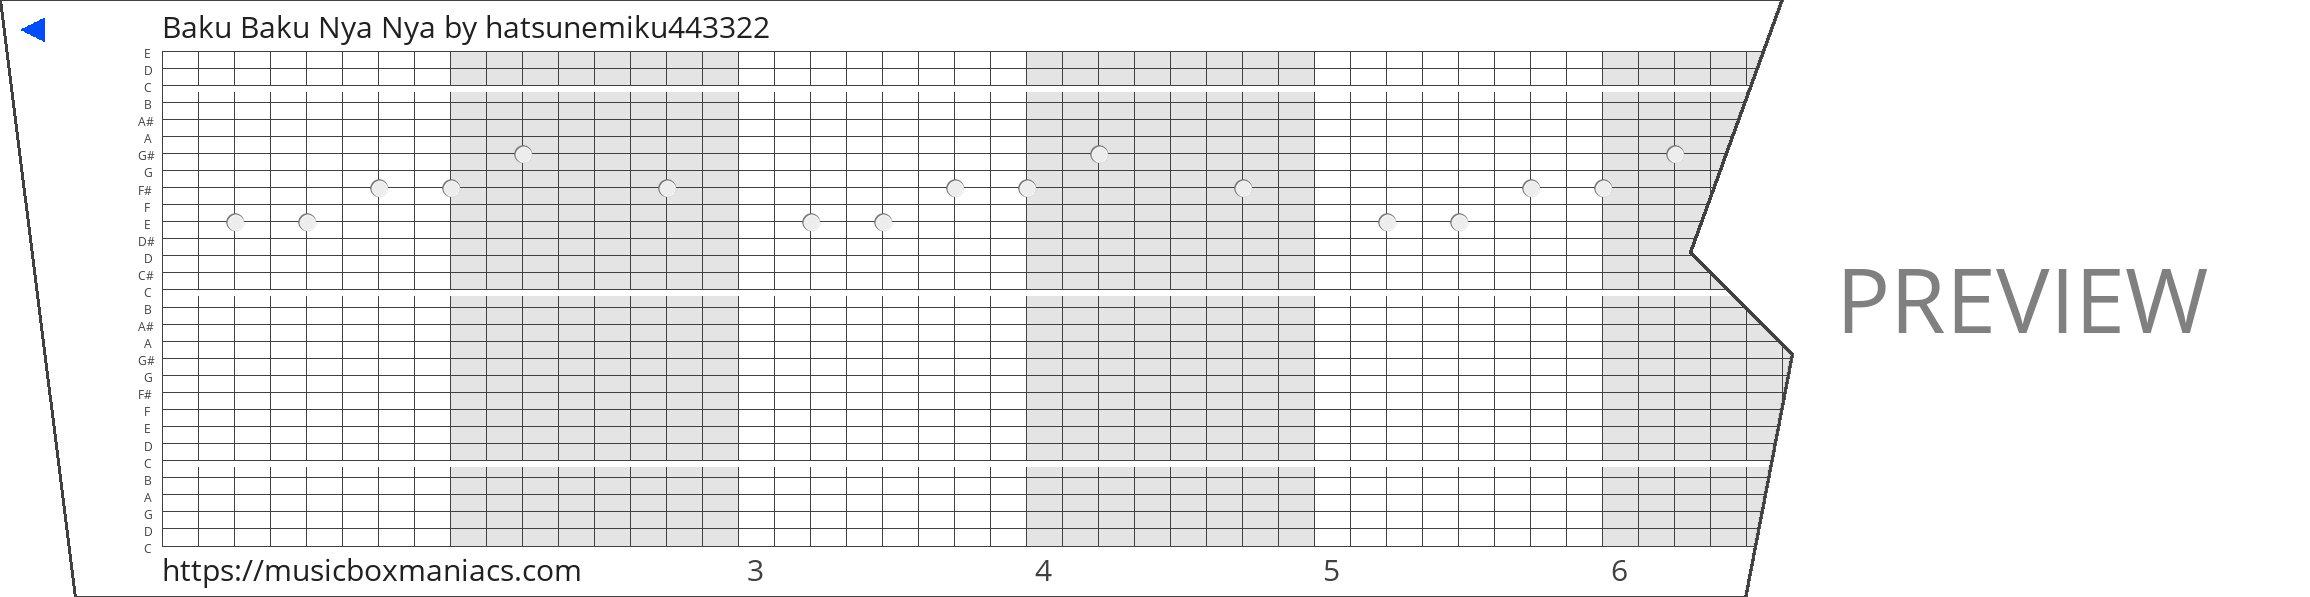 Baku Baku Nya Nya 30 note music box paper strip